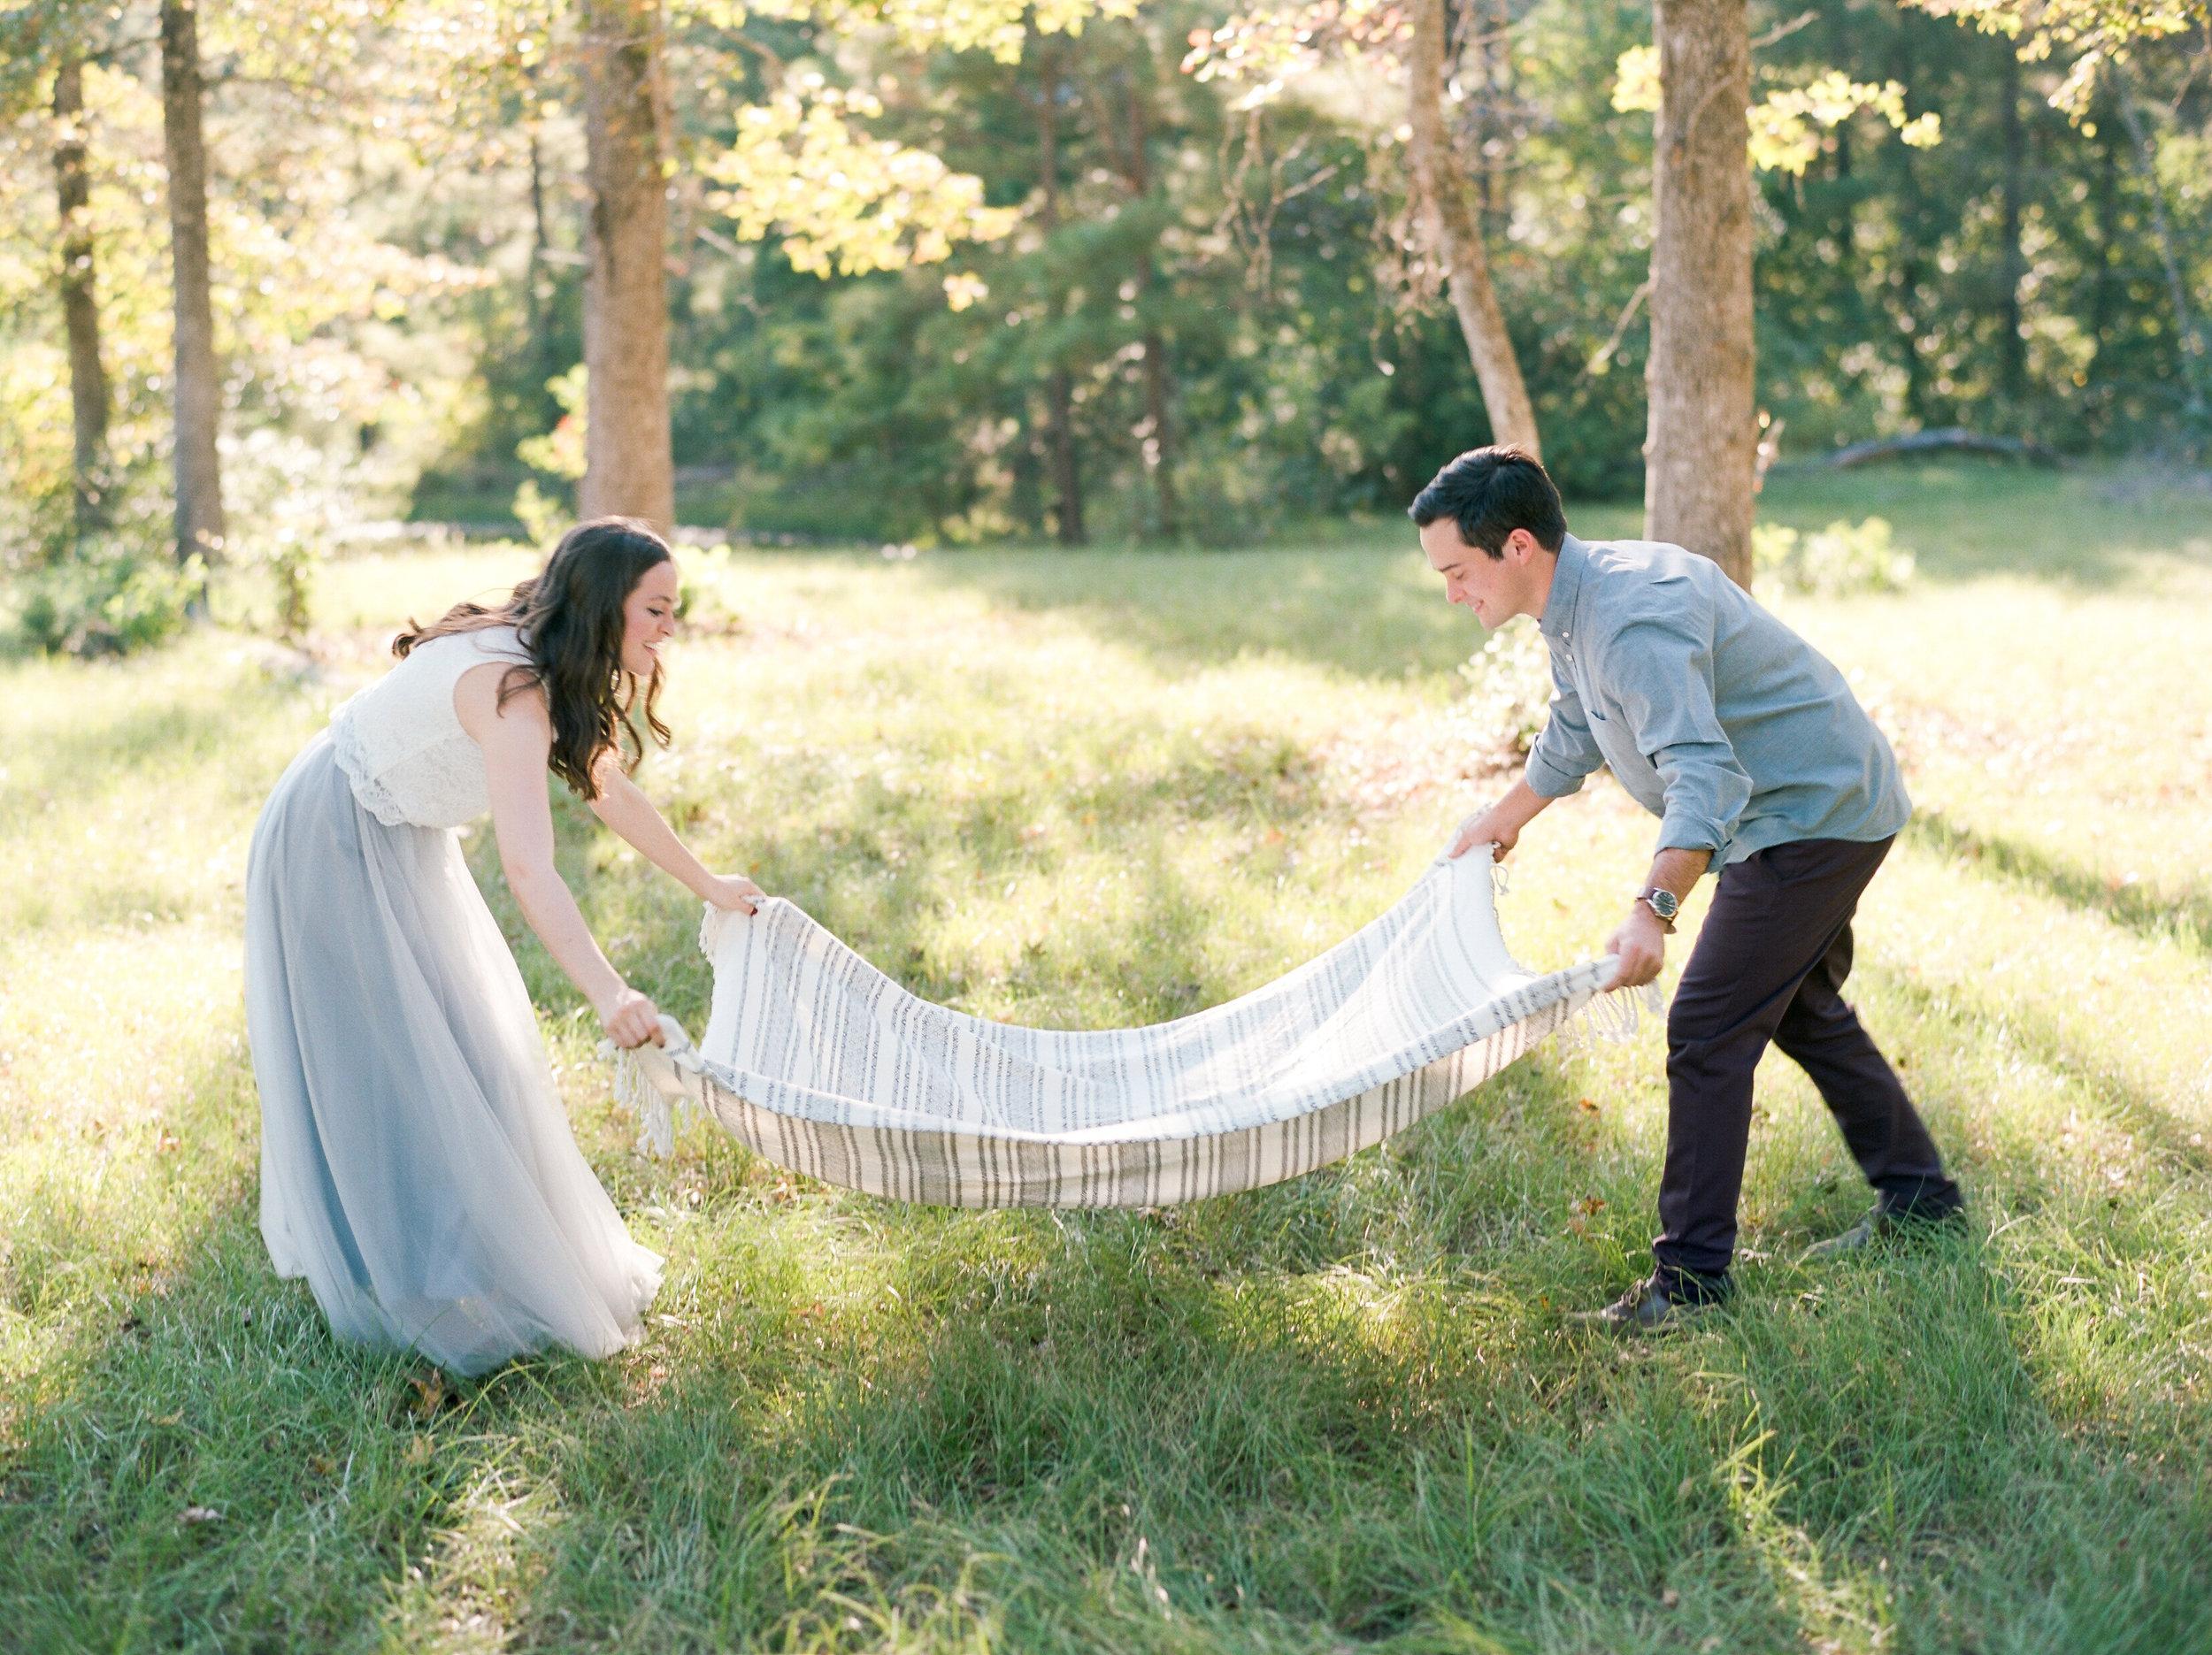 houston-wedding-photographer-college-station-austin-the-woodlands-film-photography-style-me-pretty-engagements-dana-fernandez-photography-5.jpg